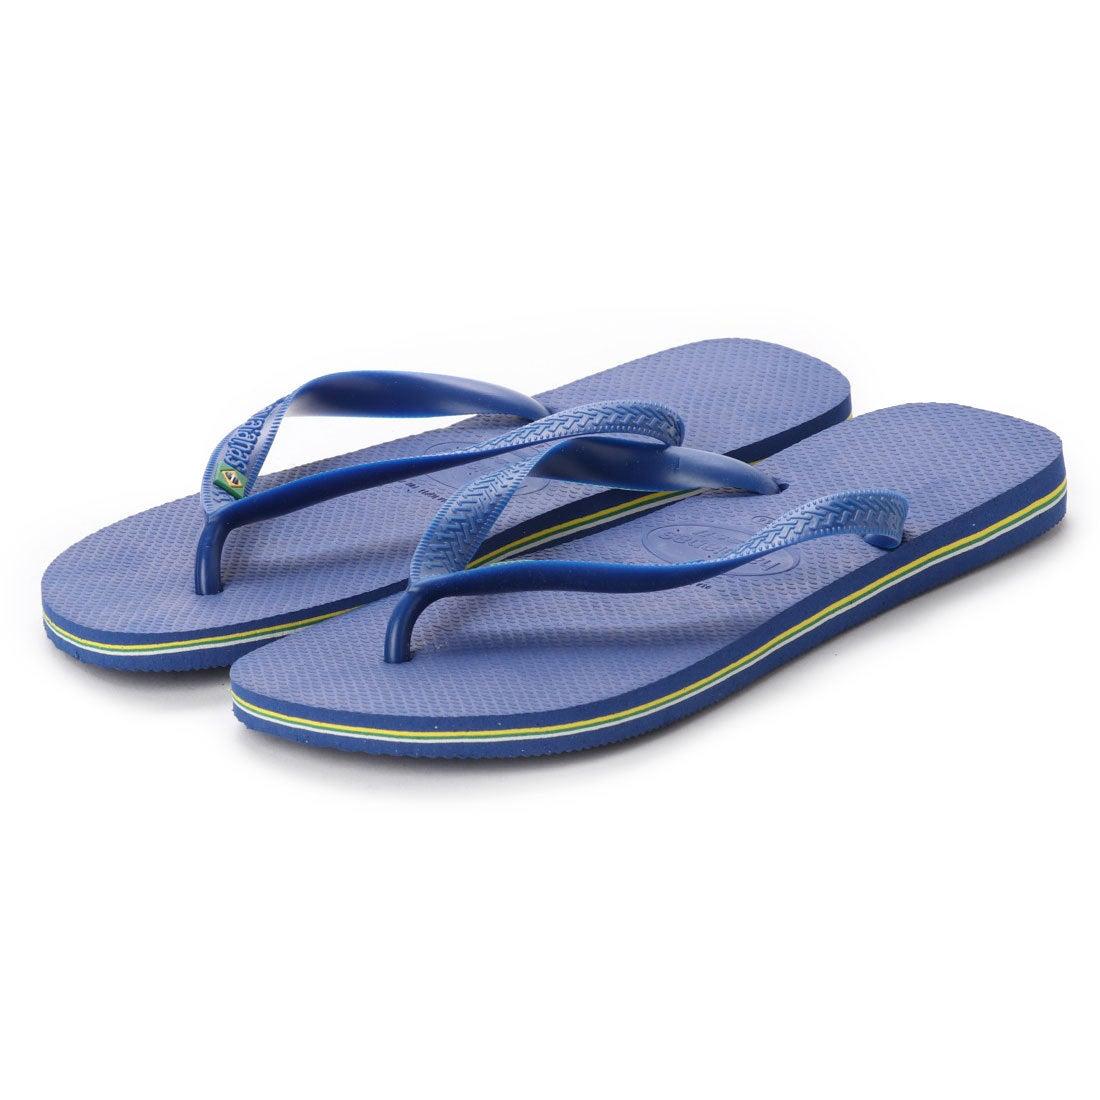 【SALE 20%OFF】ハワイアナス havaianas BRASIL (marine blue) レディース メンズ